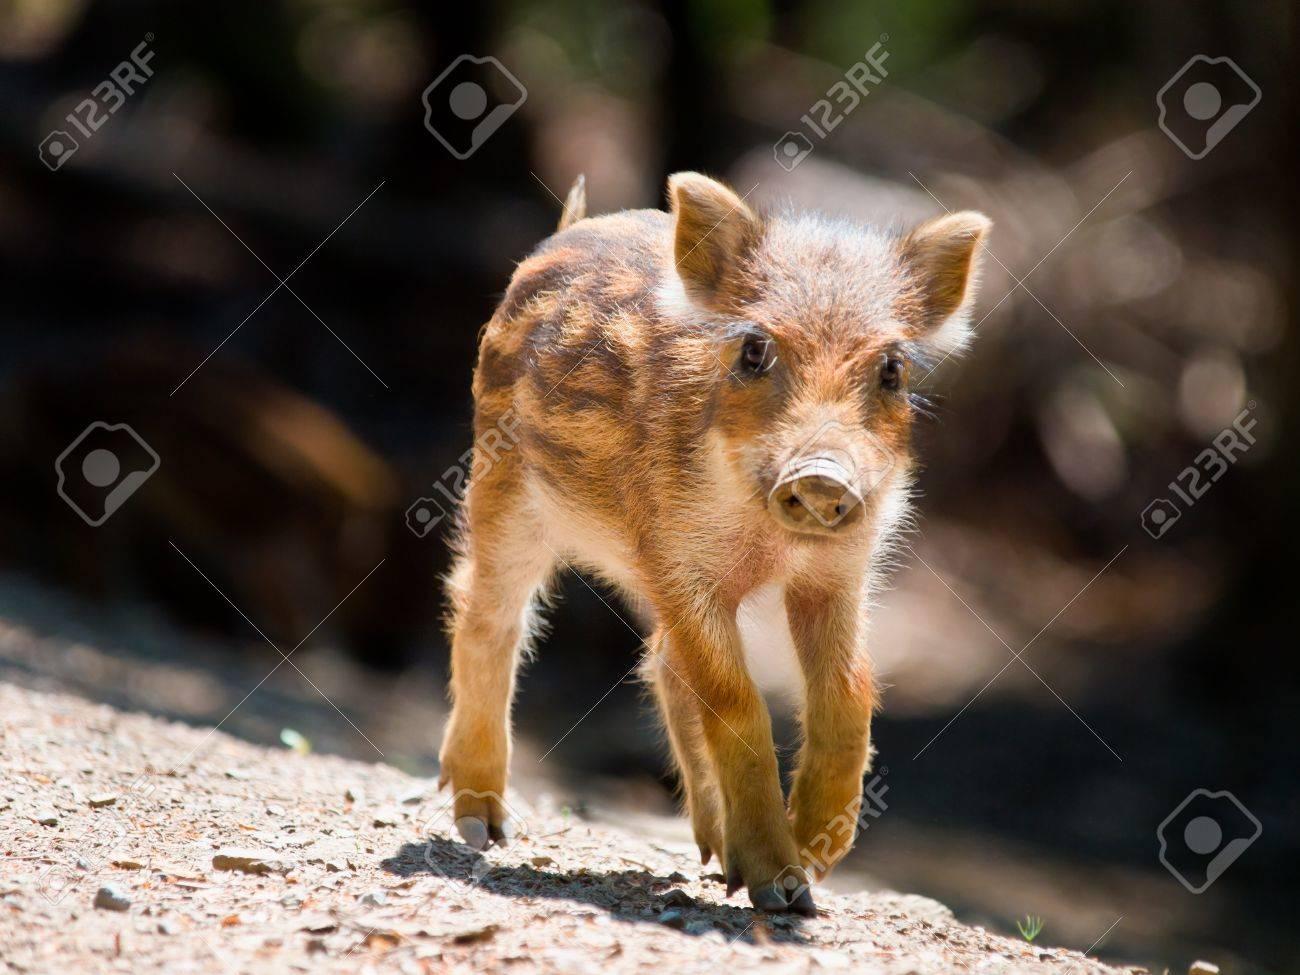 Young Wild Boar  Sus scrofa  is walking in the sun Stock Photo - 21950602